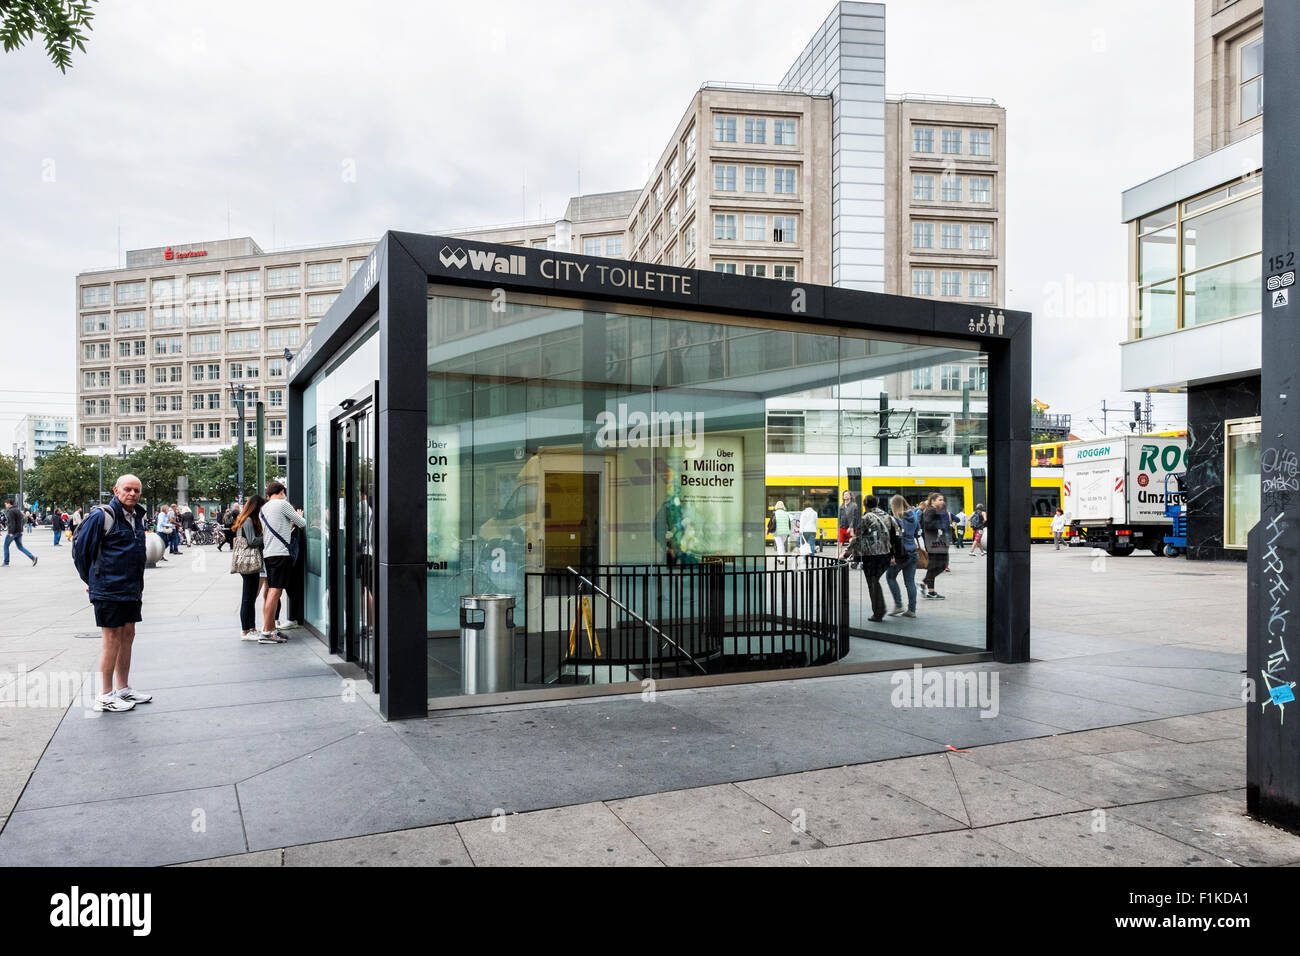 Wall City Toilette exterior - Designer public toilet, lavatory, loo, WC, public convenience. Alexanderplatz, Berlin - Stock Image